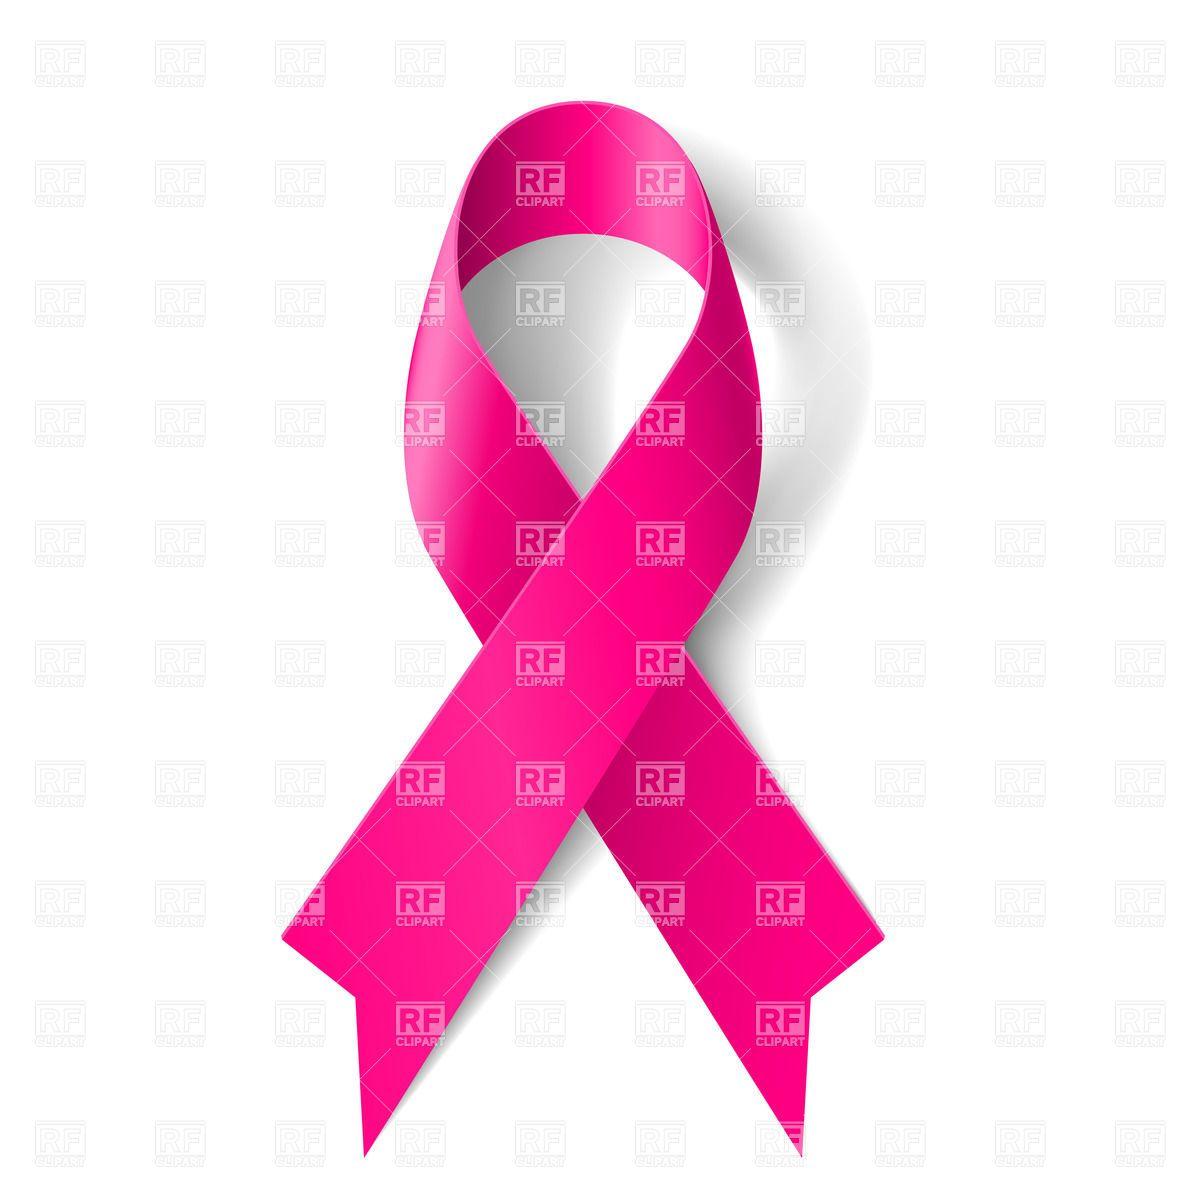 breast cancer awareness pink ribbon wk pink cancer ribbon rh pinterest com breast cancer vector free download breast cancer awareness vector free